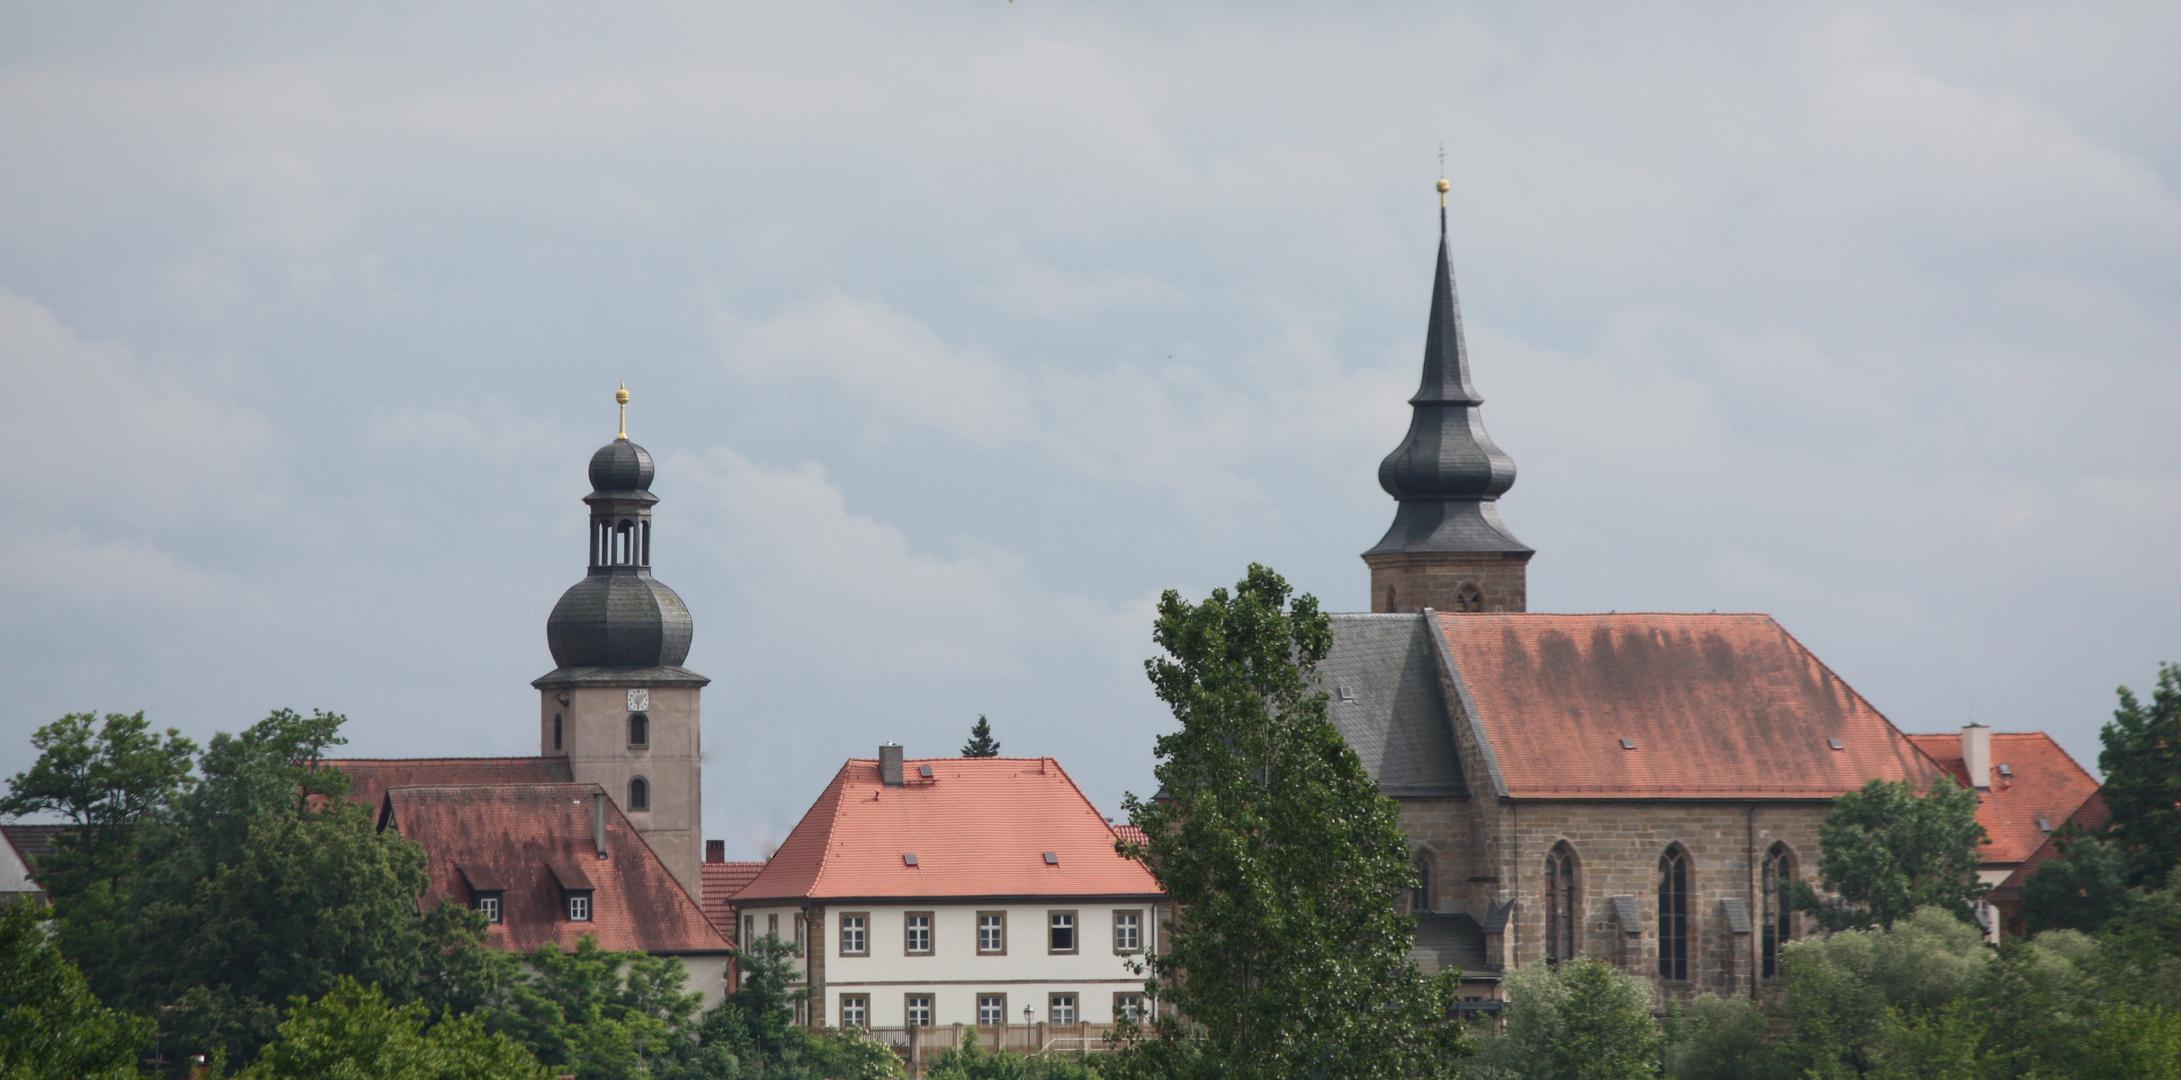 Rattelsdorf über Bamberg...